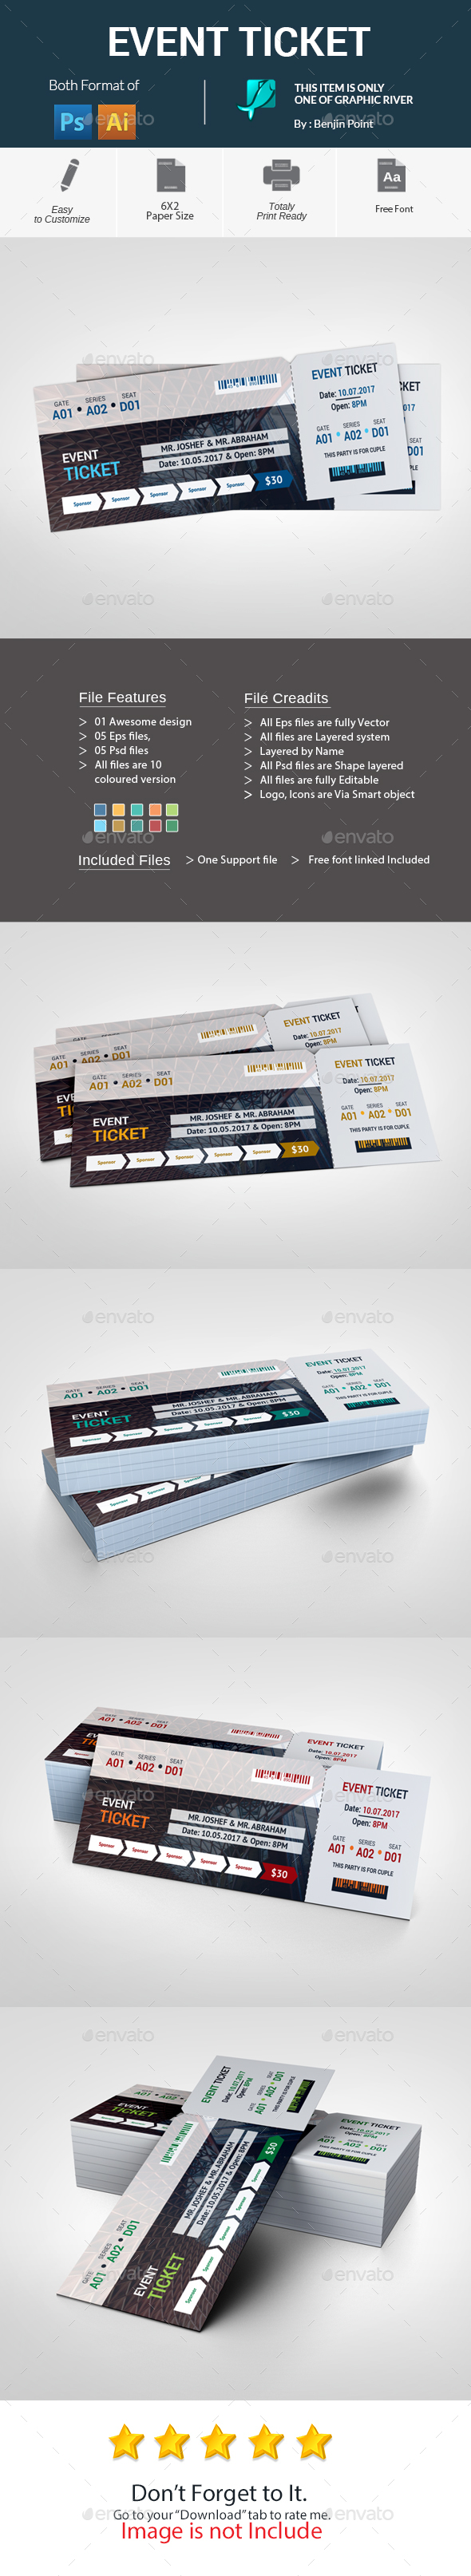 Event Ticket Template PSD, Vector EPS, AI Illustrator | Ticket ...